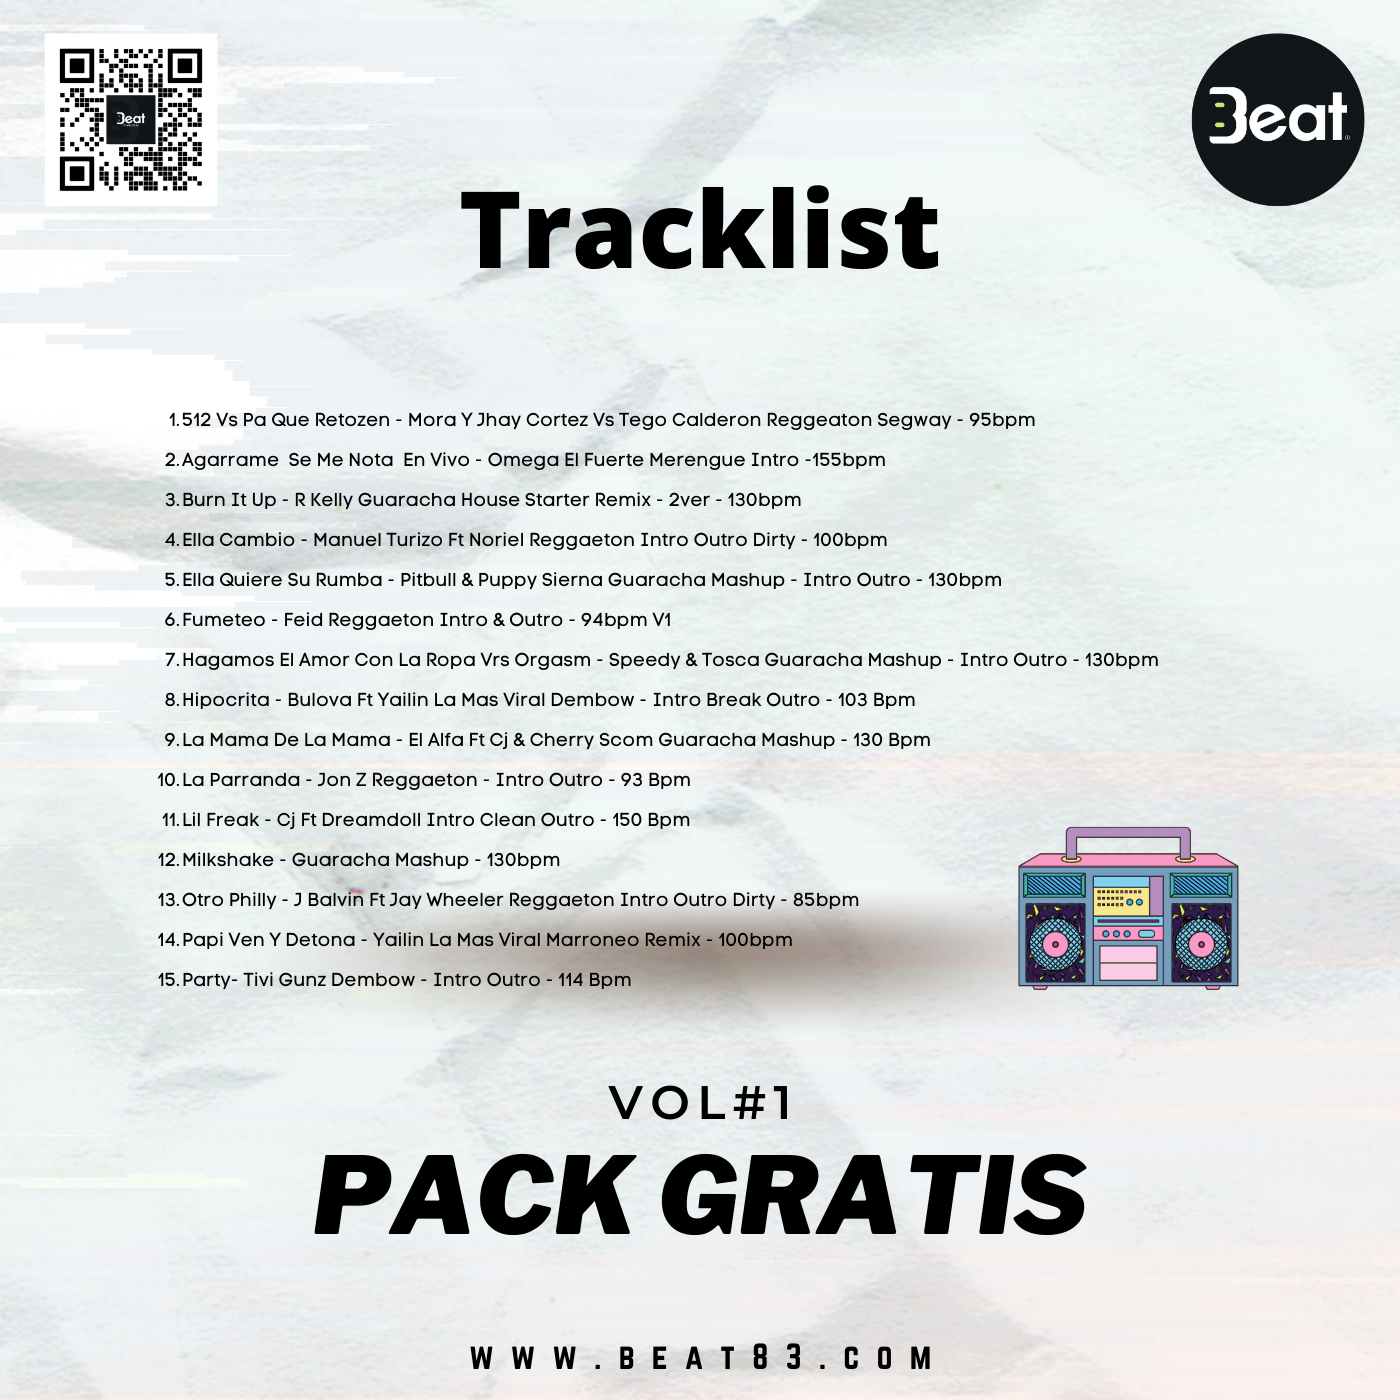 pack vol 1